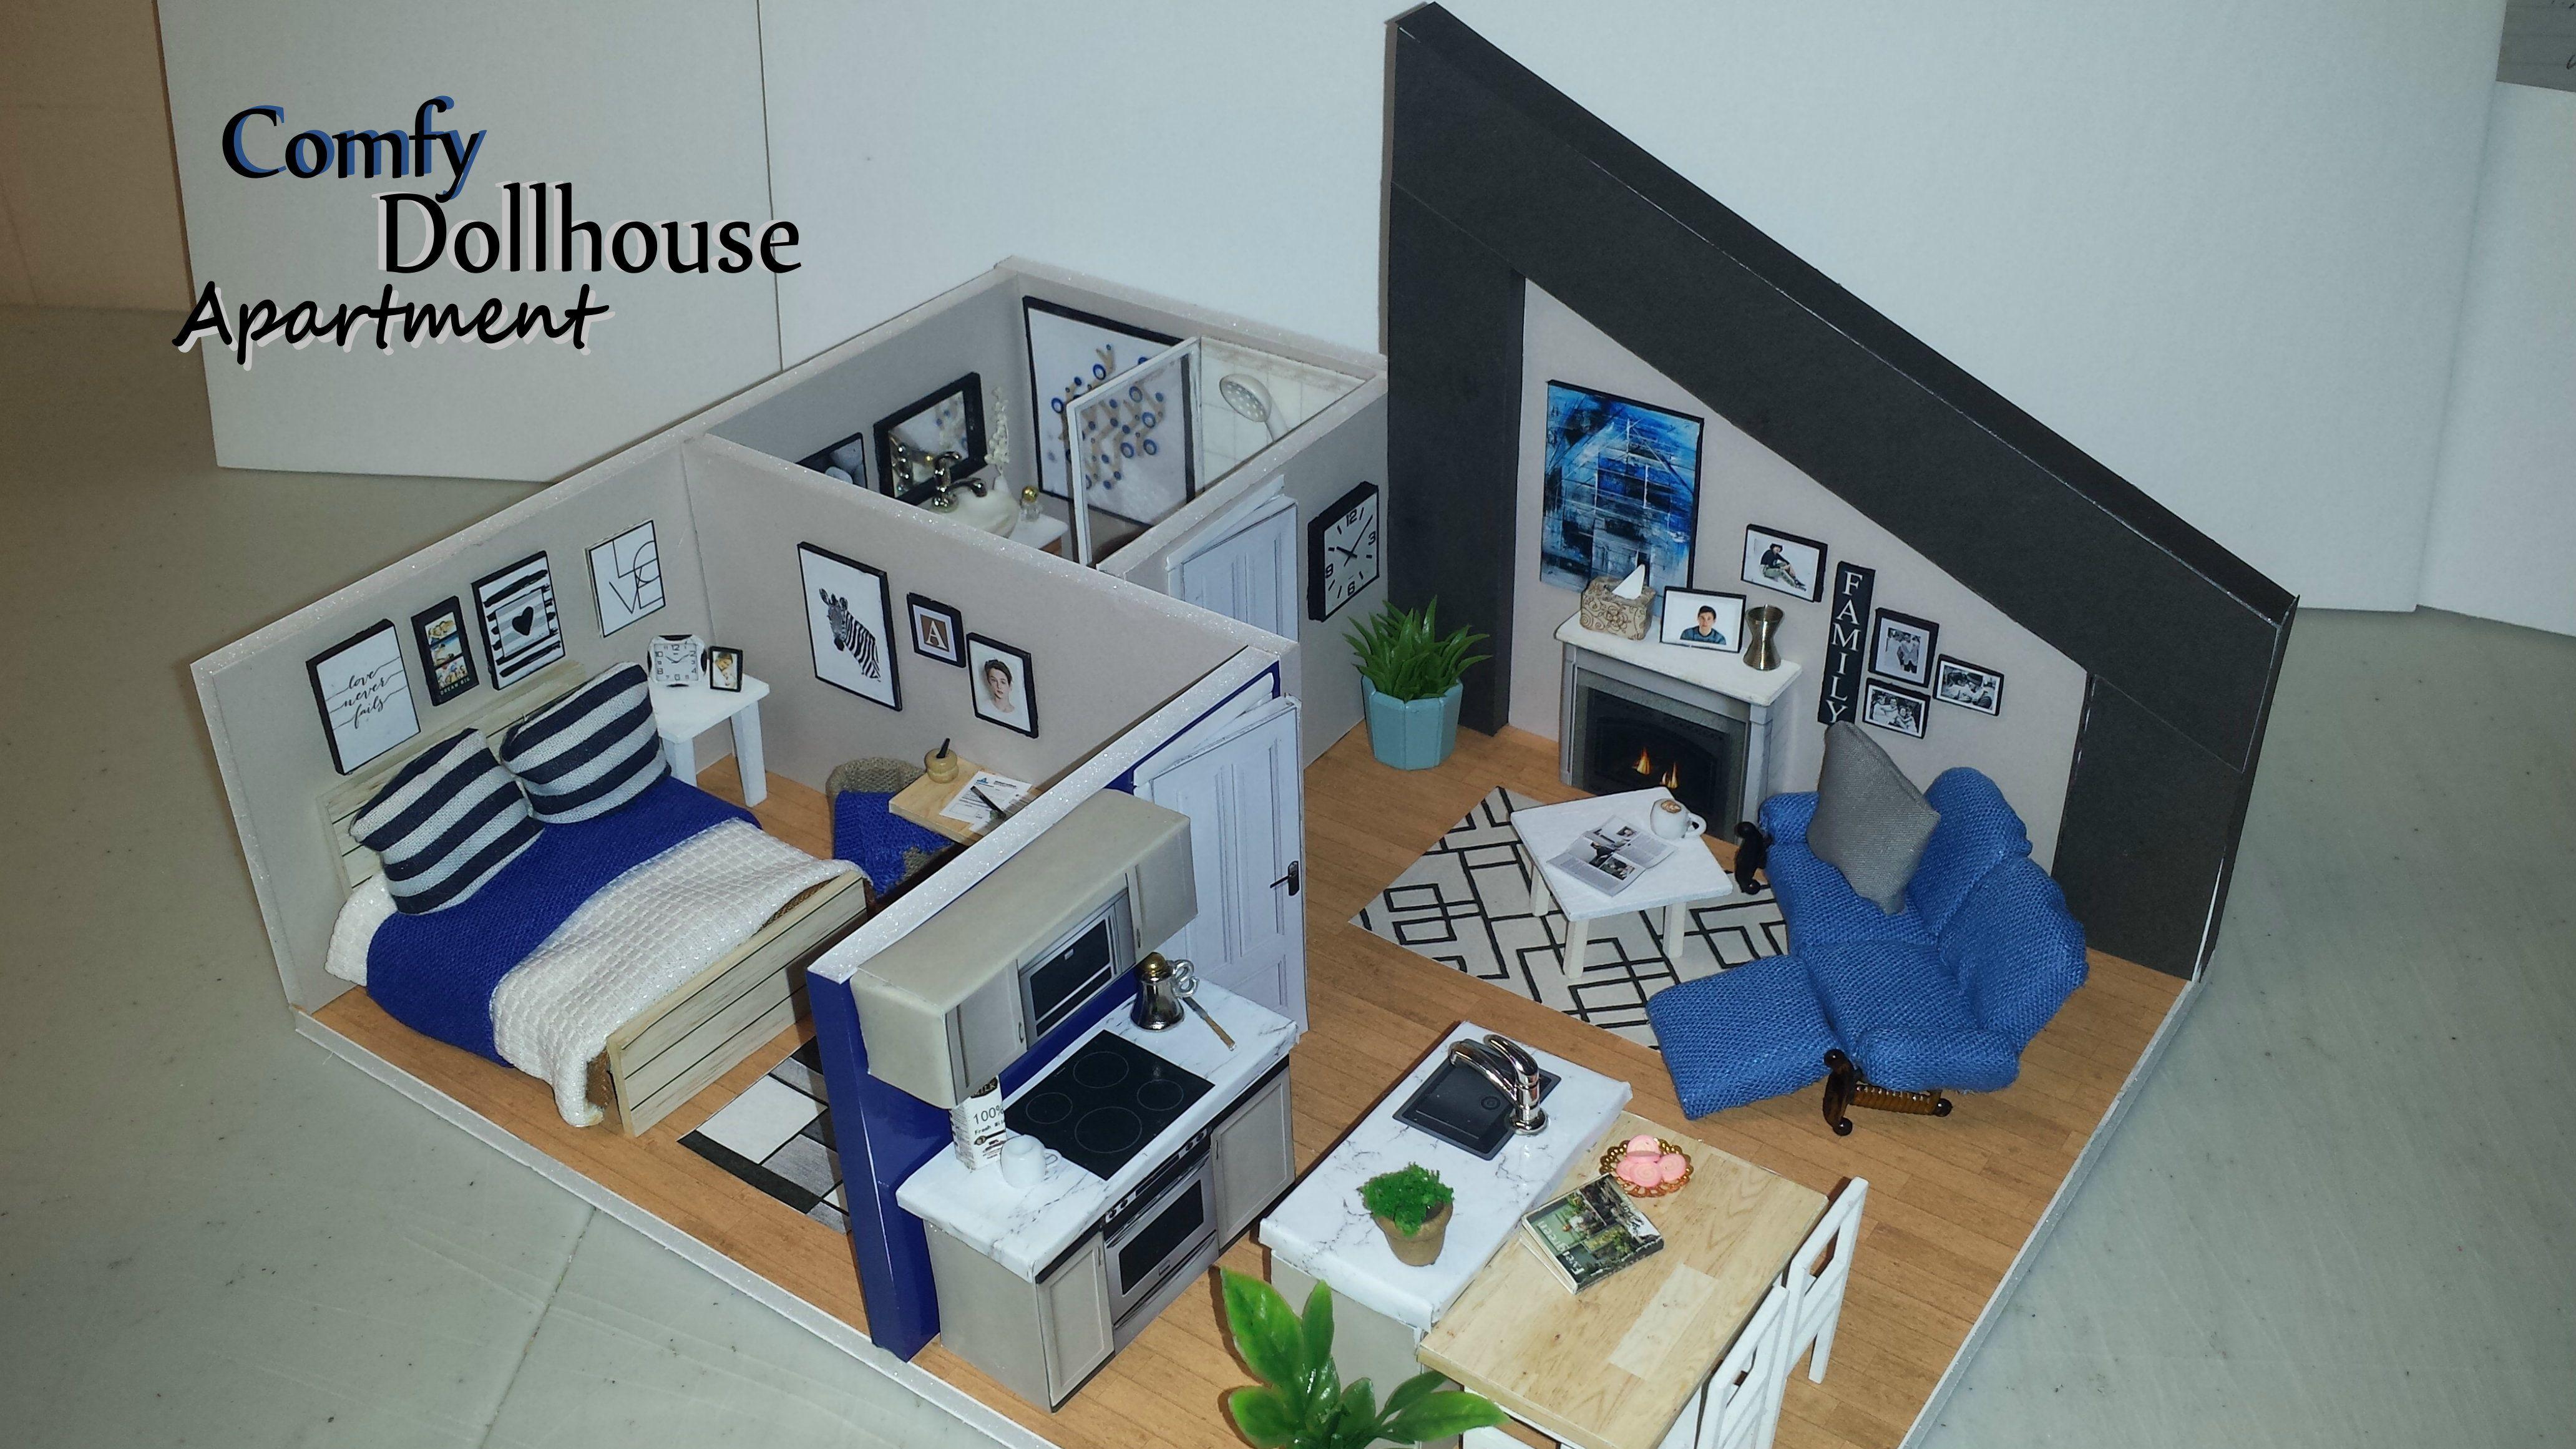 Diy miniature comfy dollhouse apartment